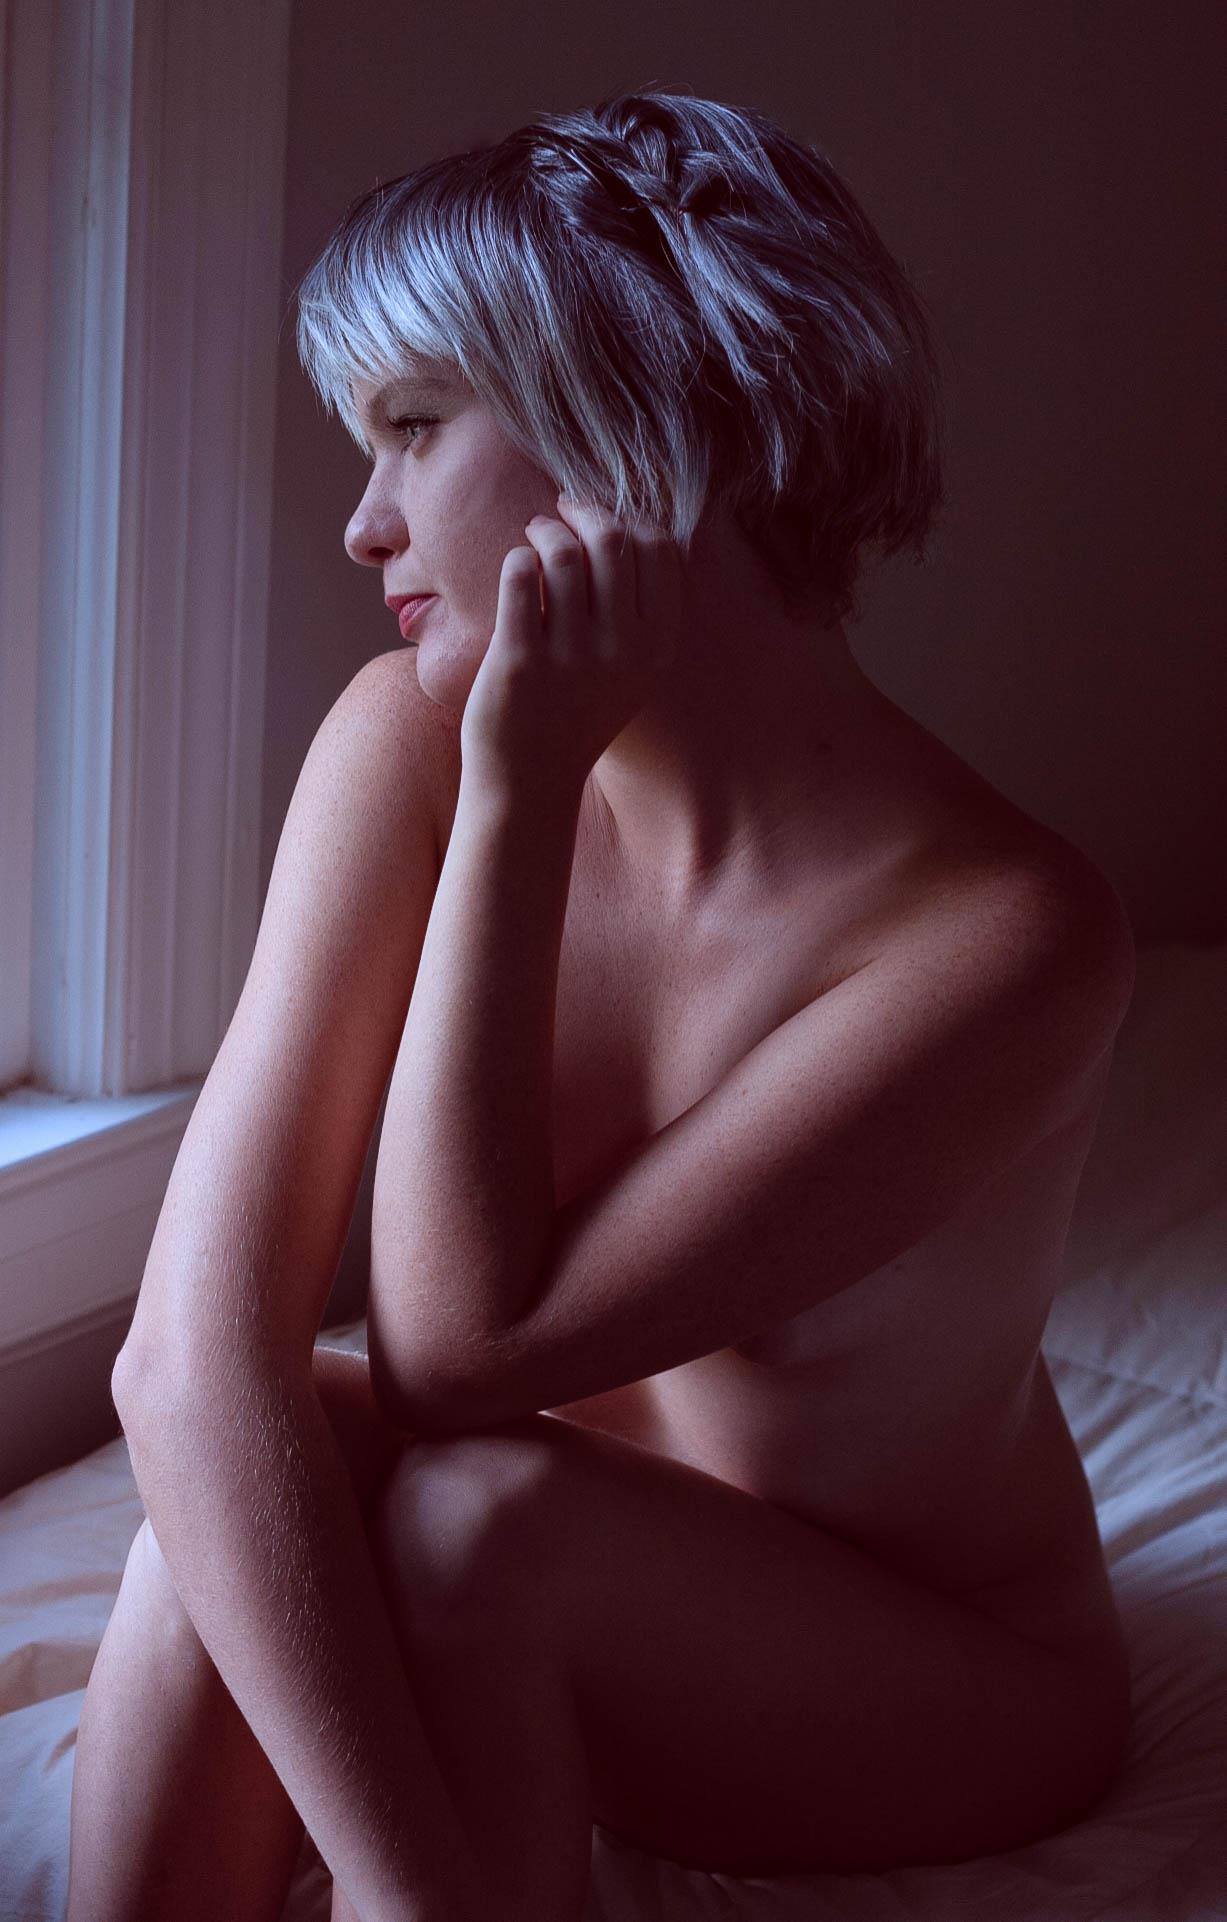 Photographer: Kaylee J. Knight